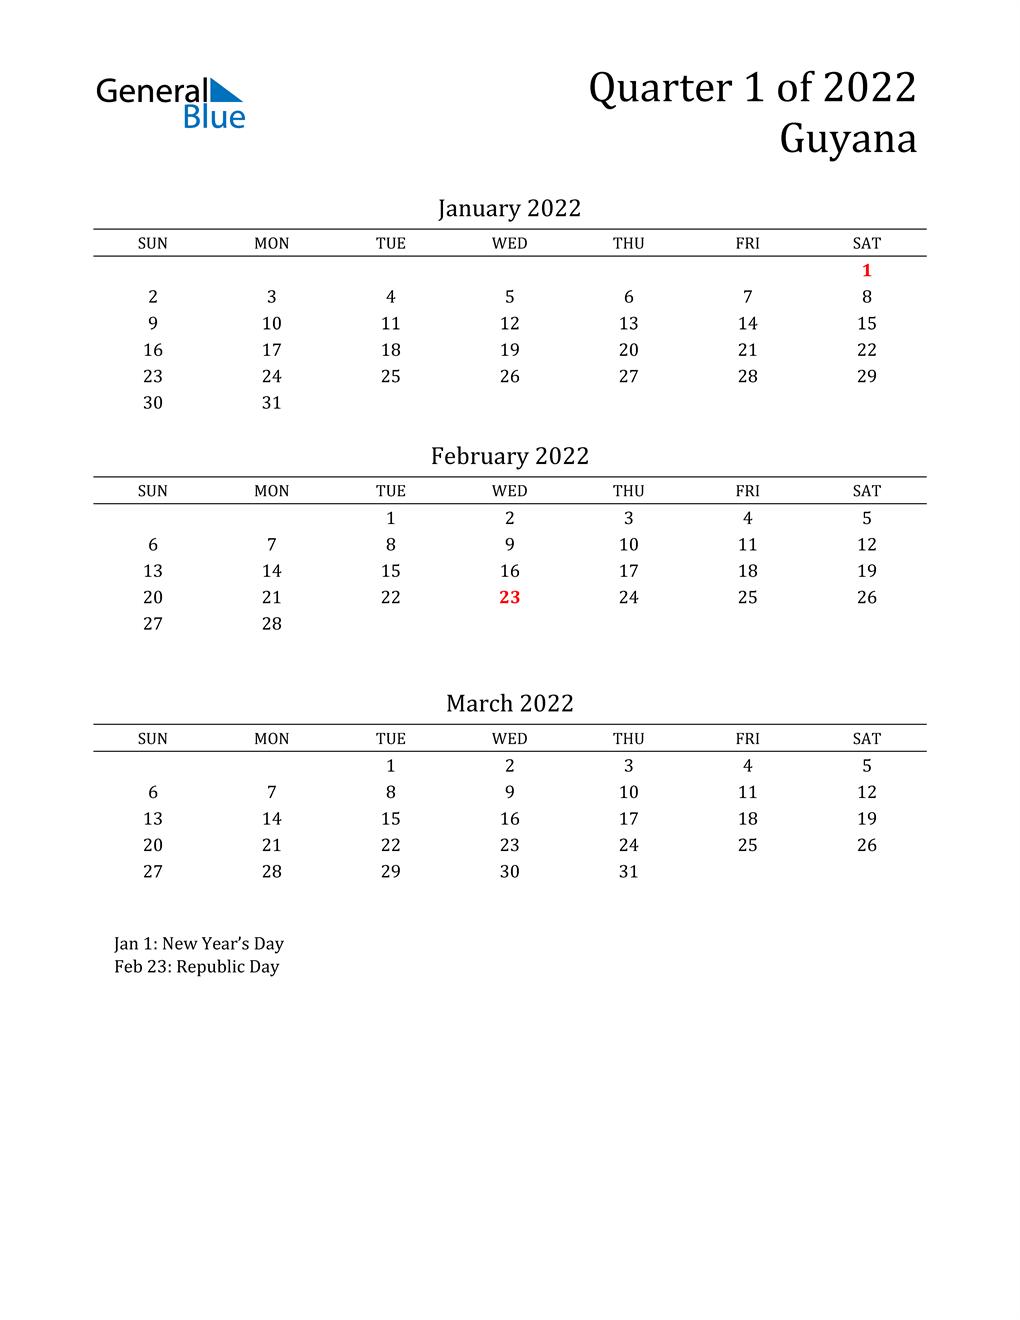 2022 Guyana Quarterly Calendar